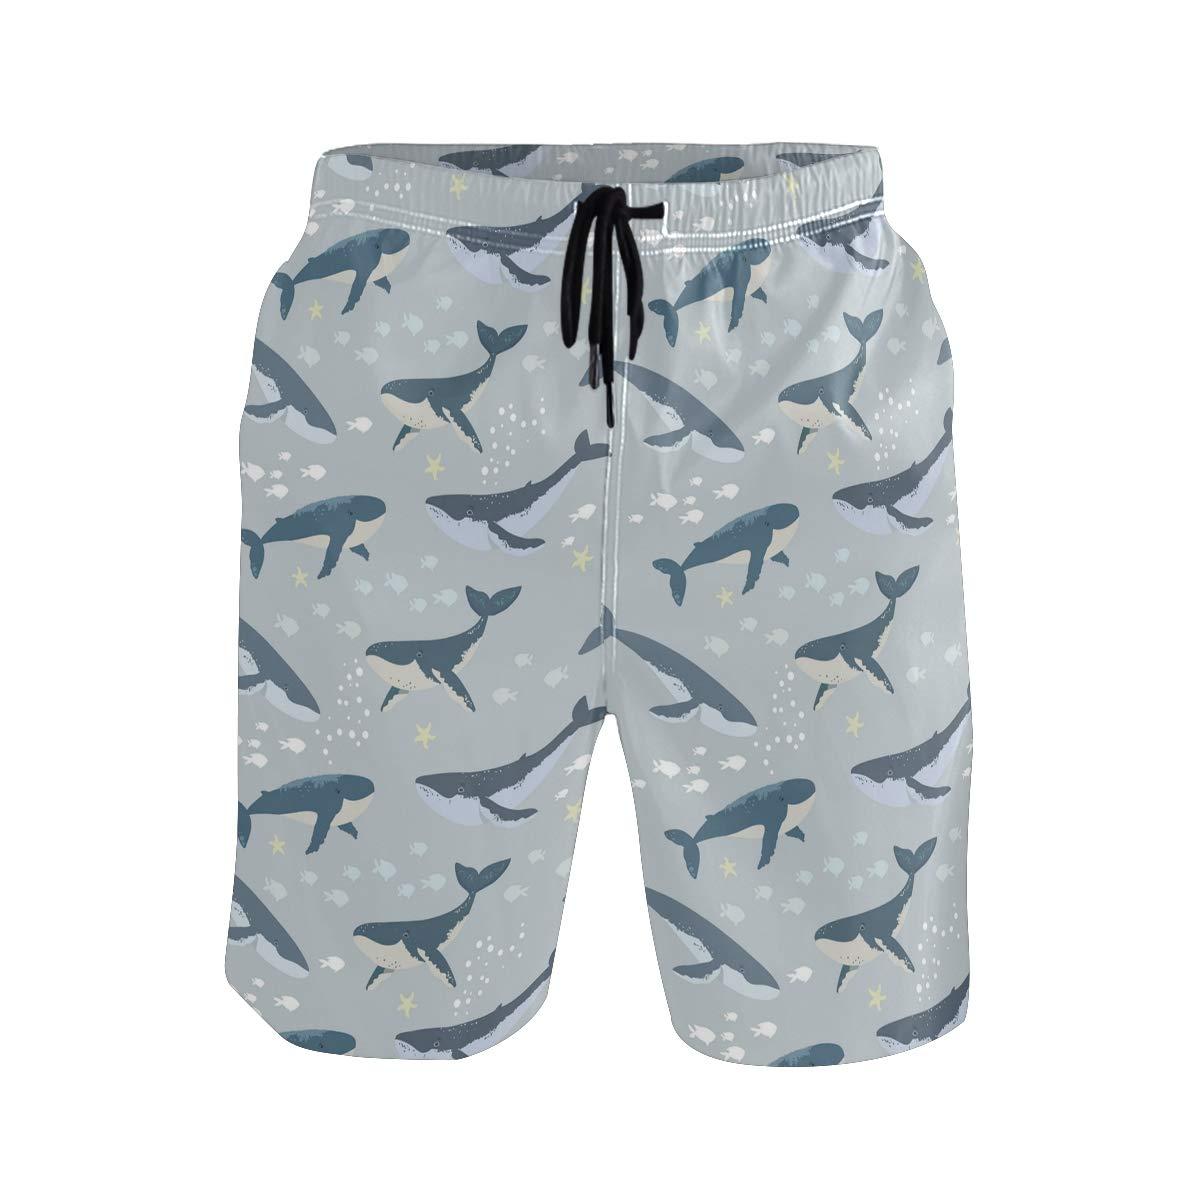 Mens Medium Length Large Blue Whale Shark Beach Shorts Casual Athletic Swimming Pants